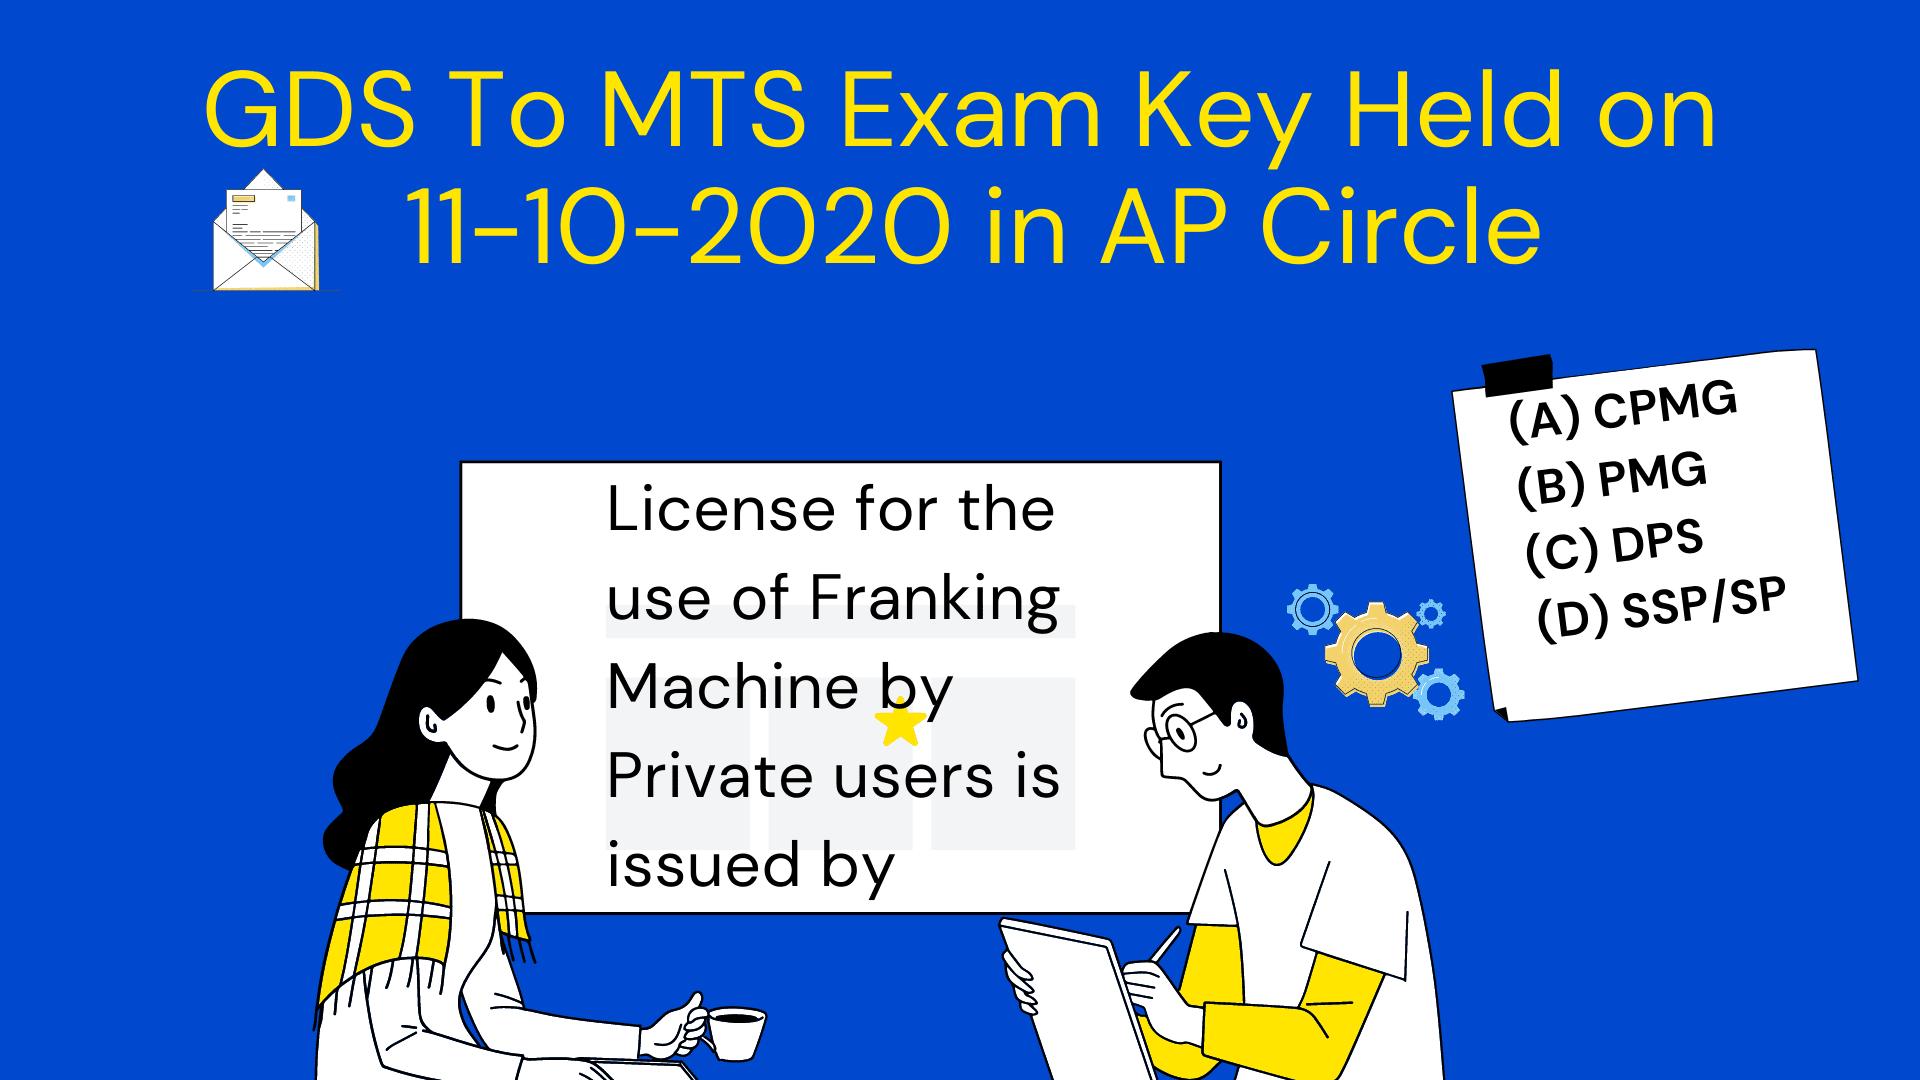 GDS-to-MTS-Exam-Key